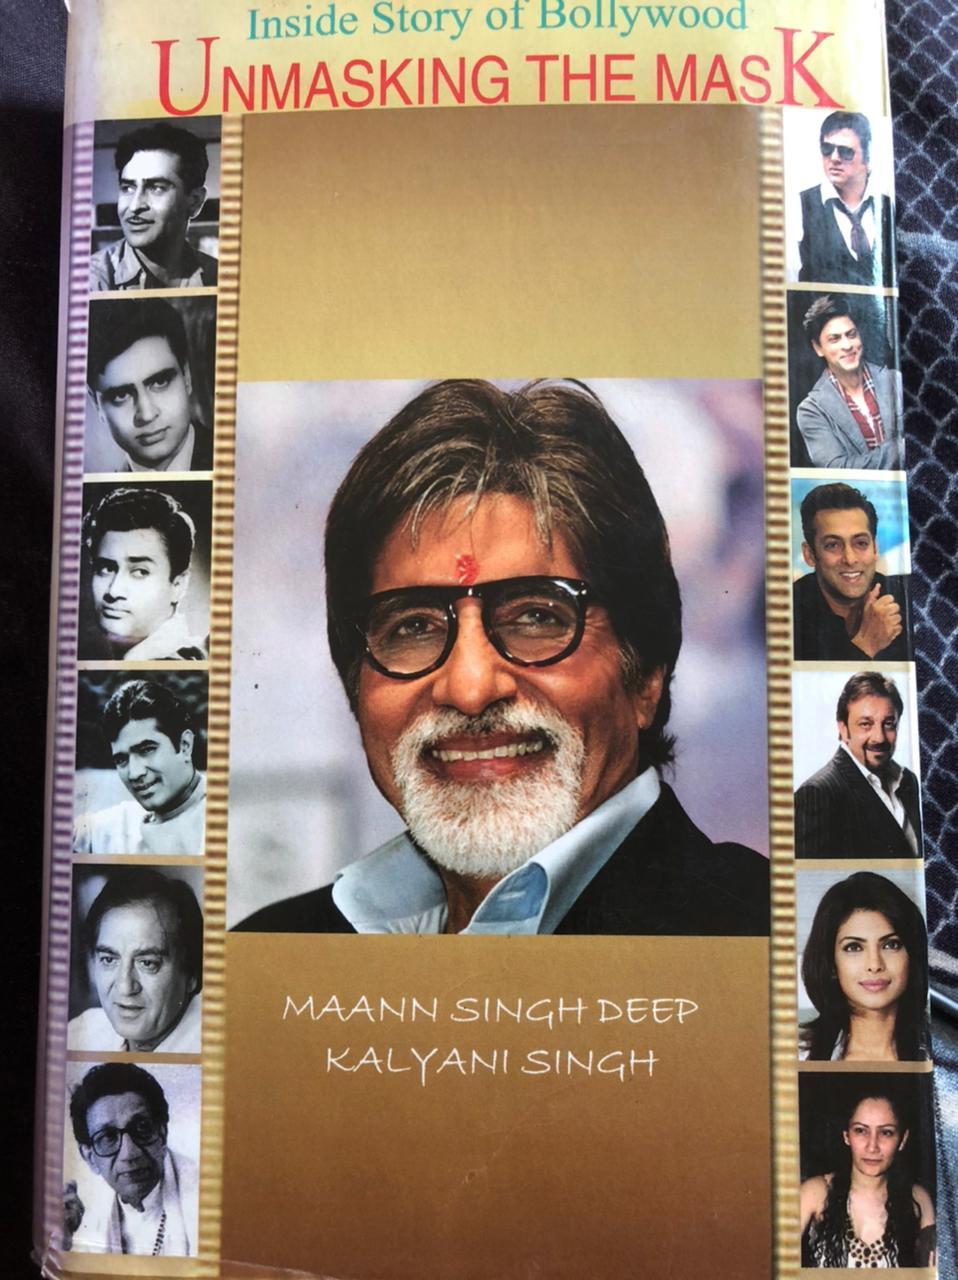 Inside Story Of Bollywood - Unmasking The Mask